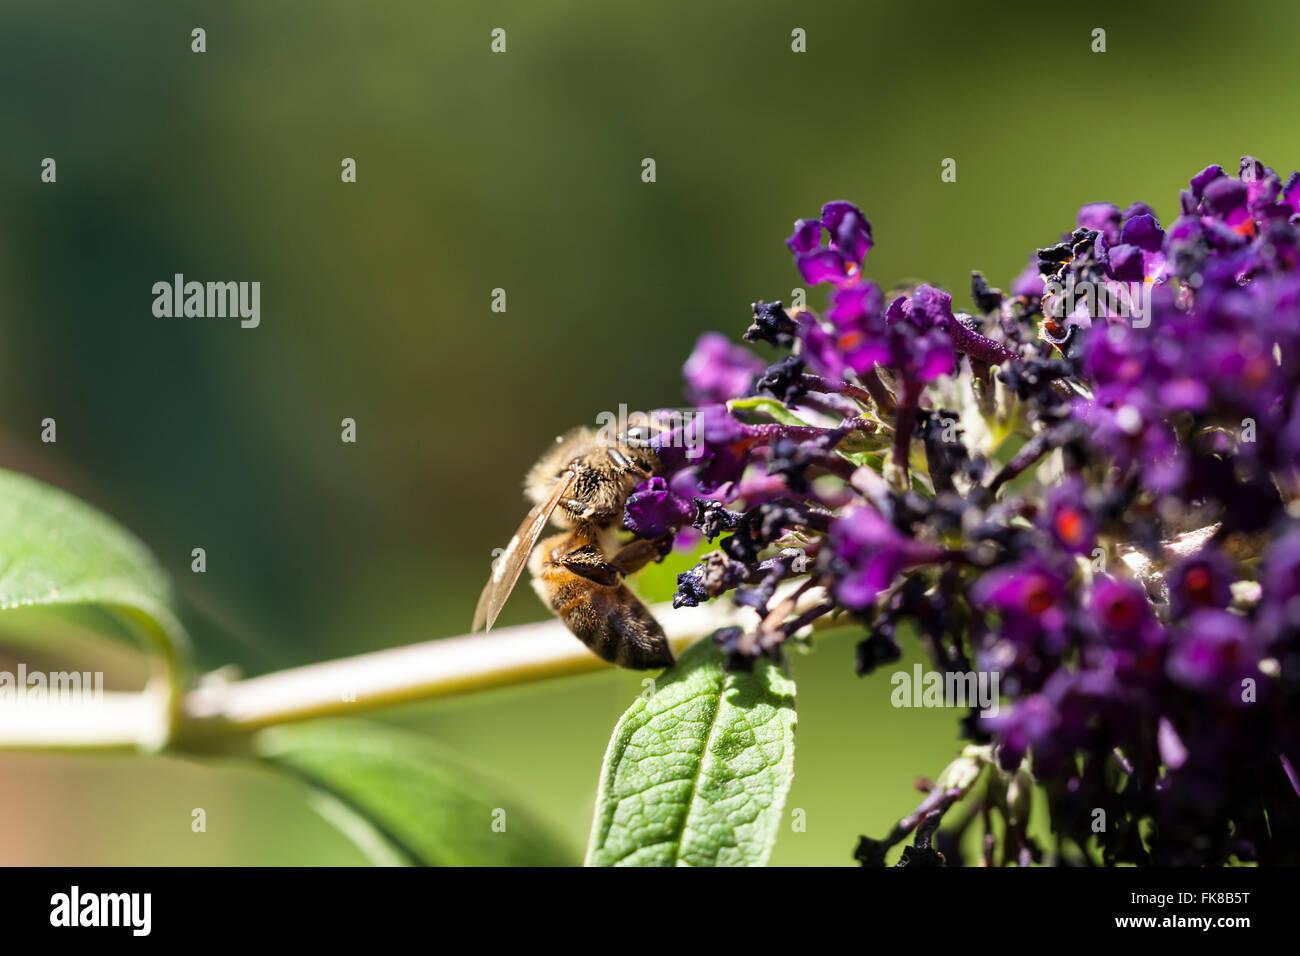 Butterfly in garden - Stock Image